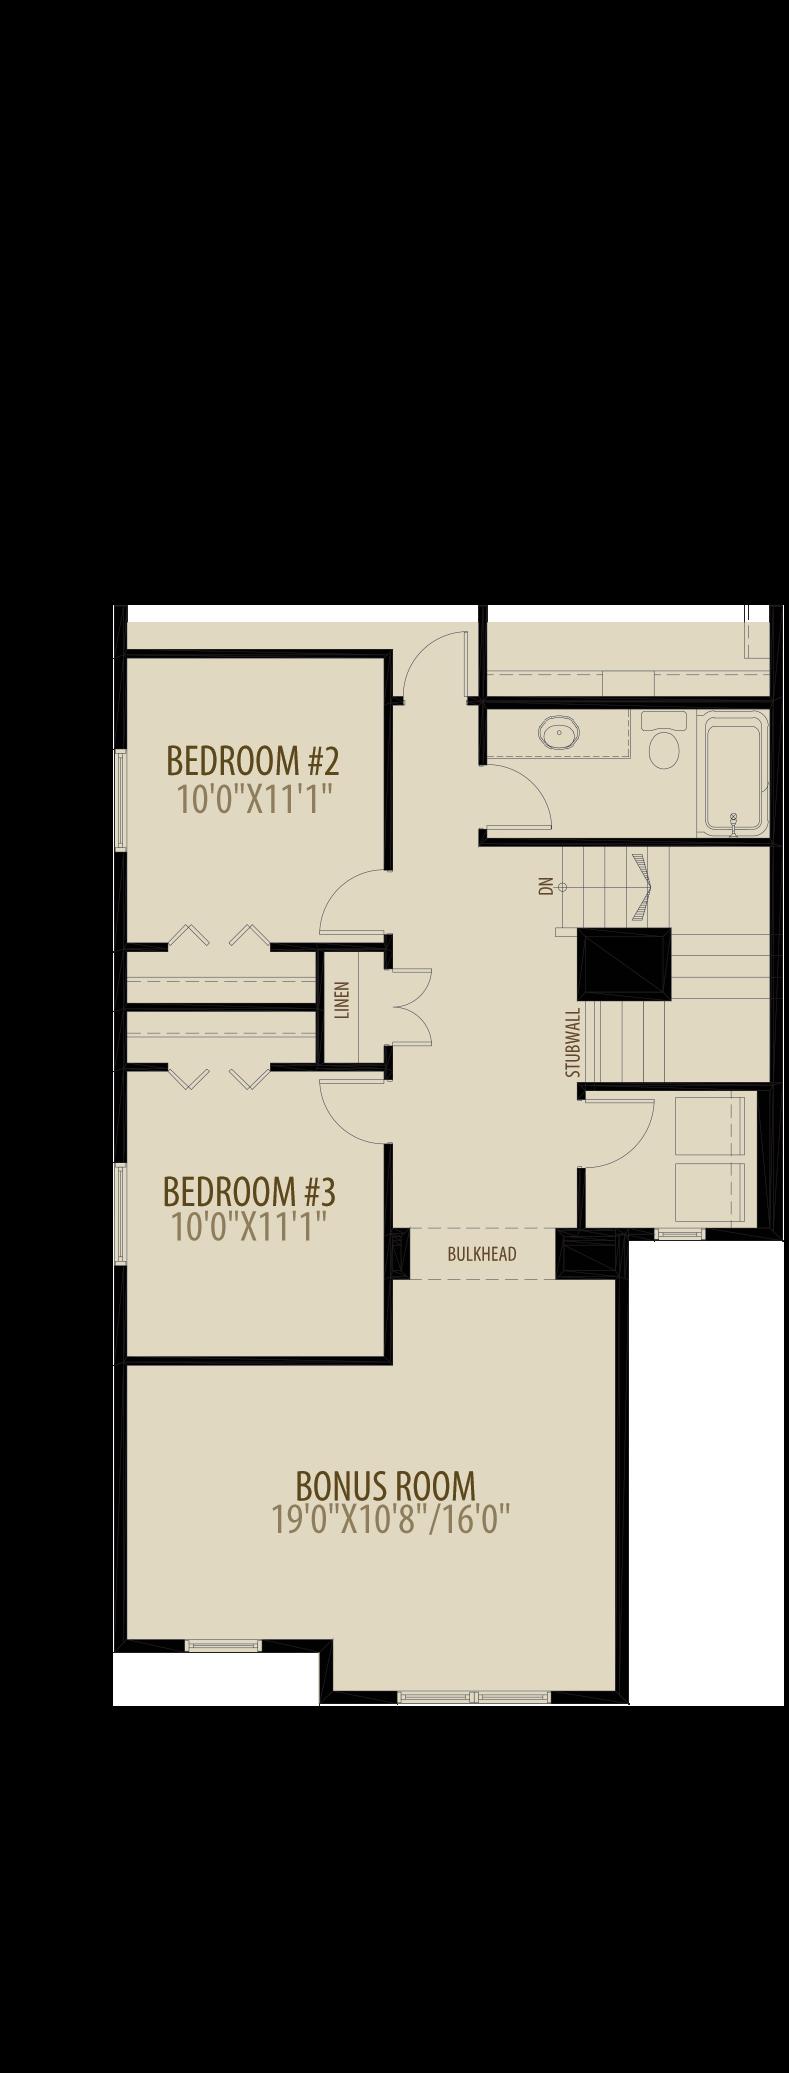 Optional Upper Floor w Laundry Adds 44 sq ft